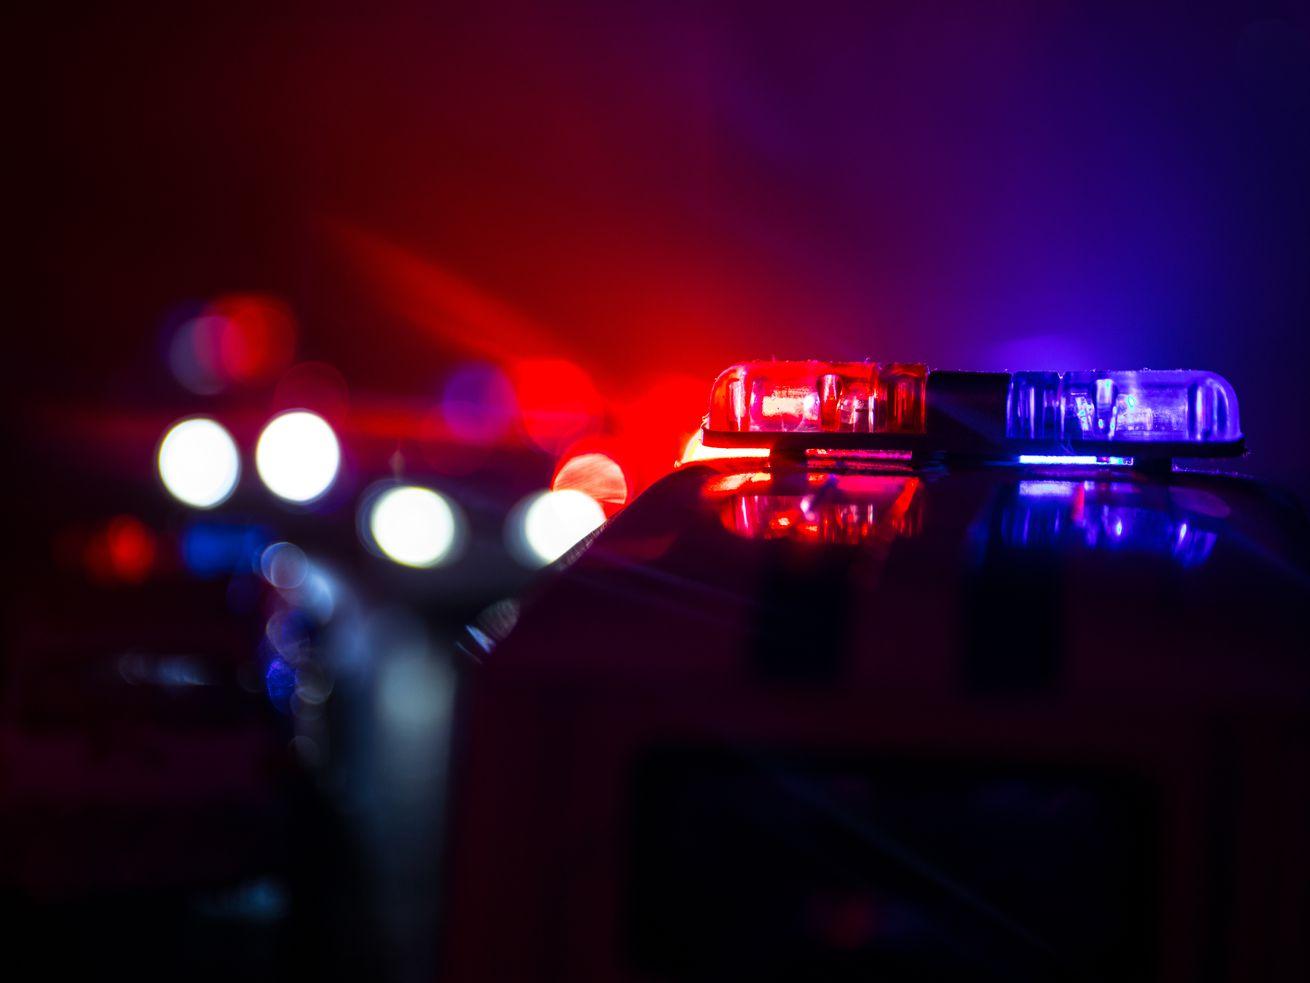 A man drove into a CFD ambulance April 5, 2021 in South Shore.